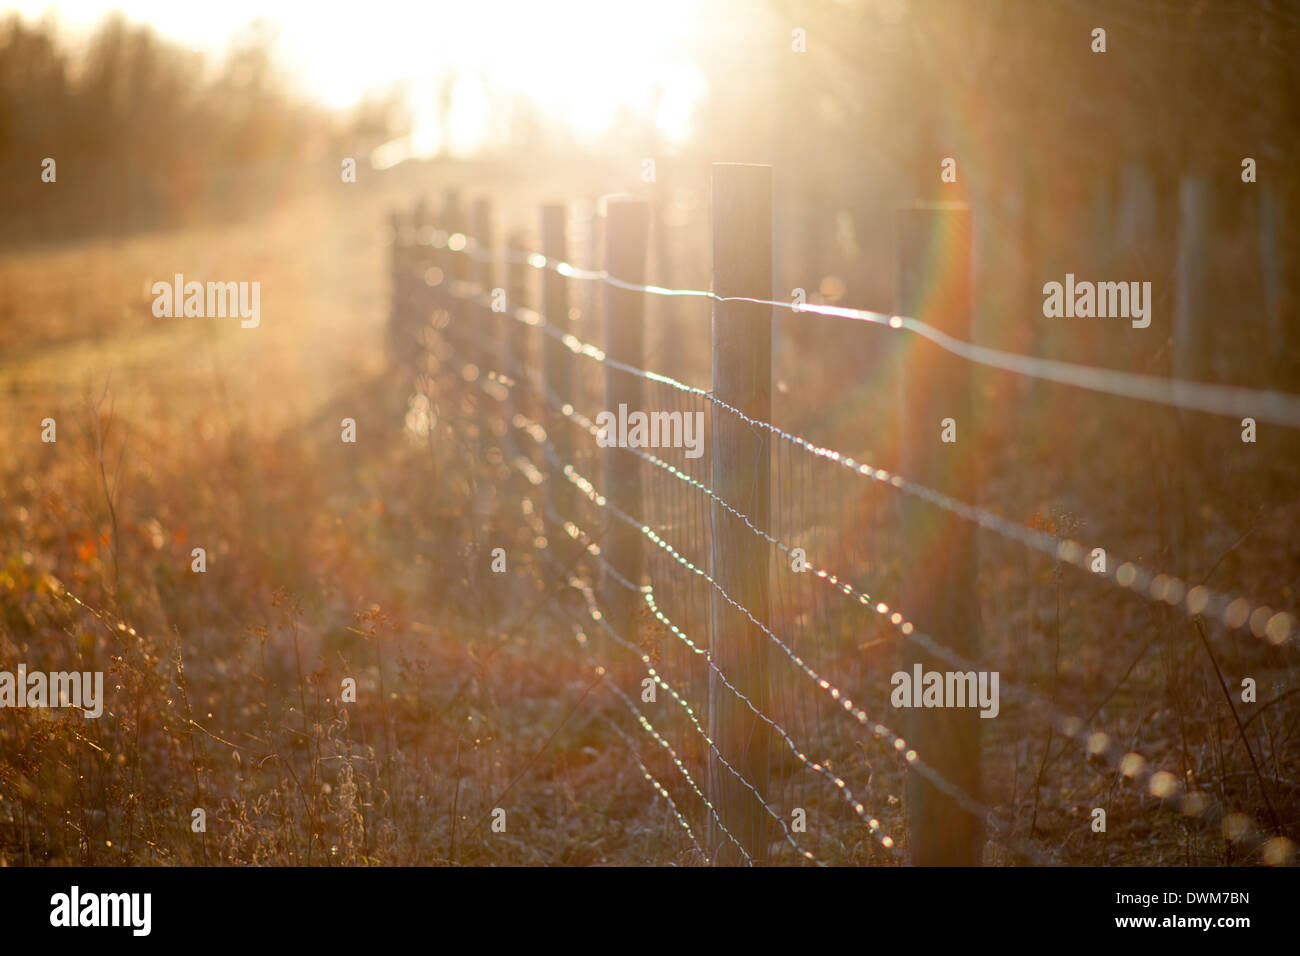 Blendenfleck Blick direkt in die Sonne entlang eines Zaunes im Wandlebury Country Park, Cambridge Landschaft Stockbild